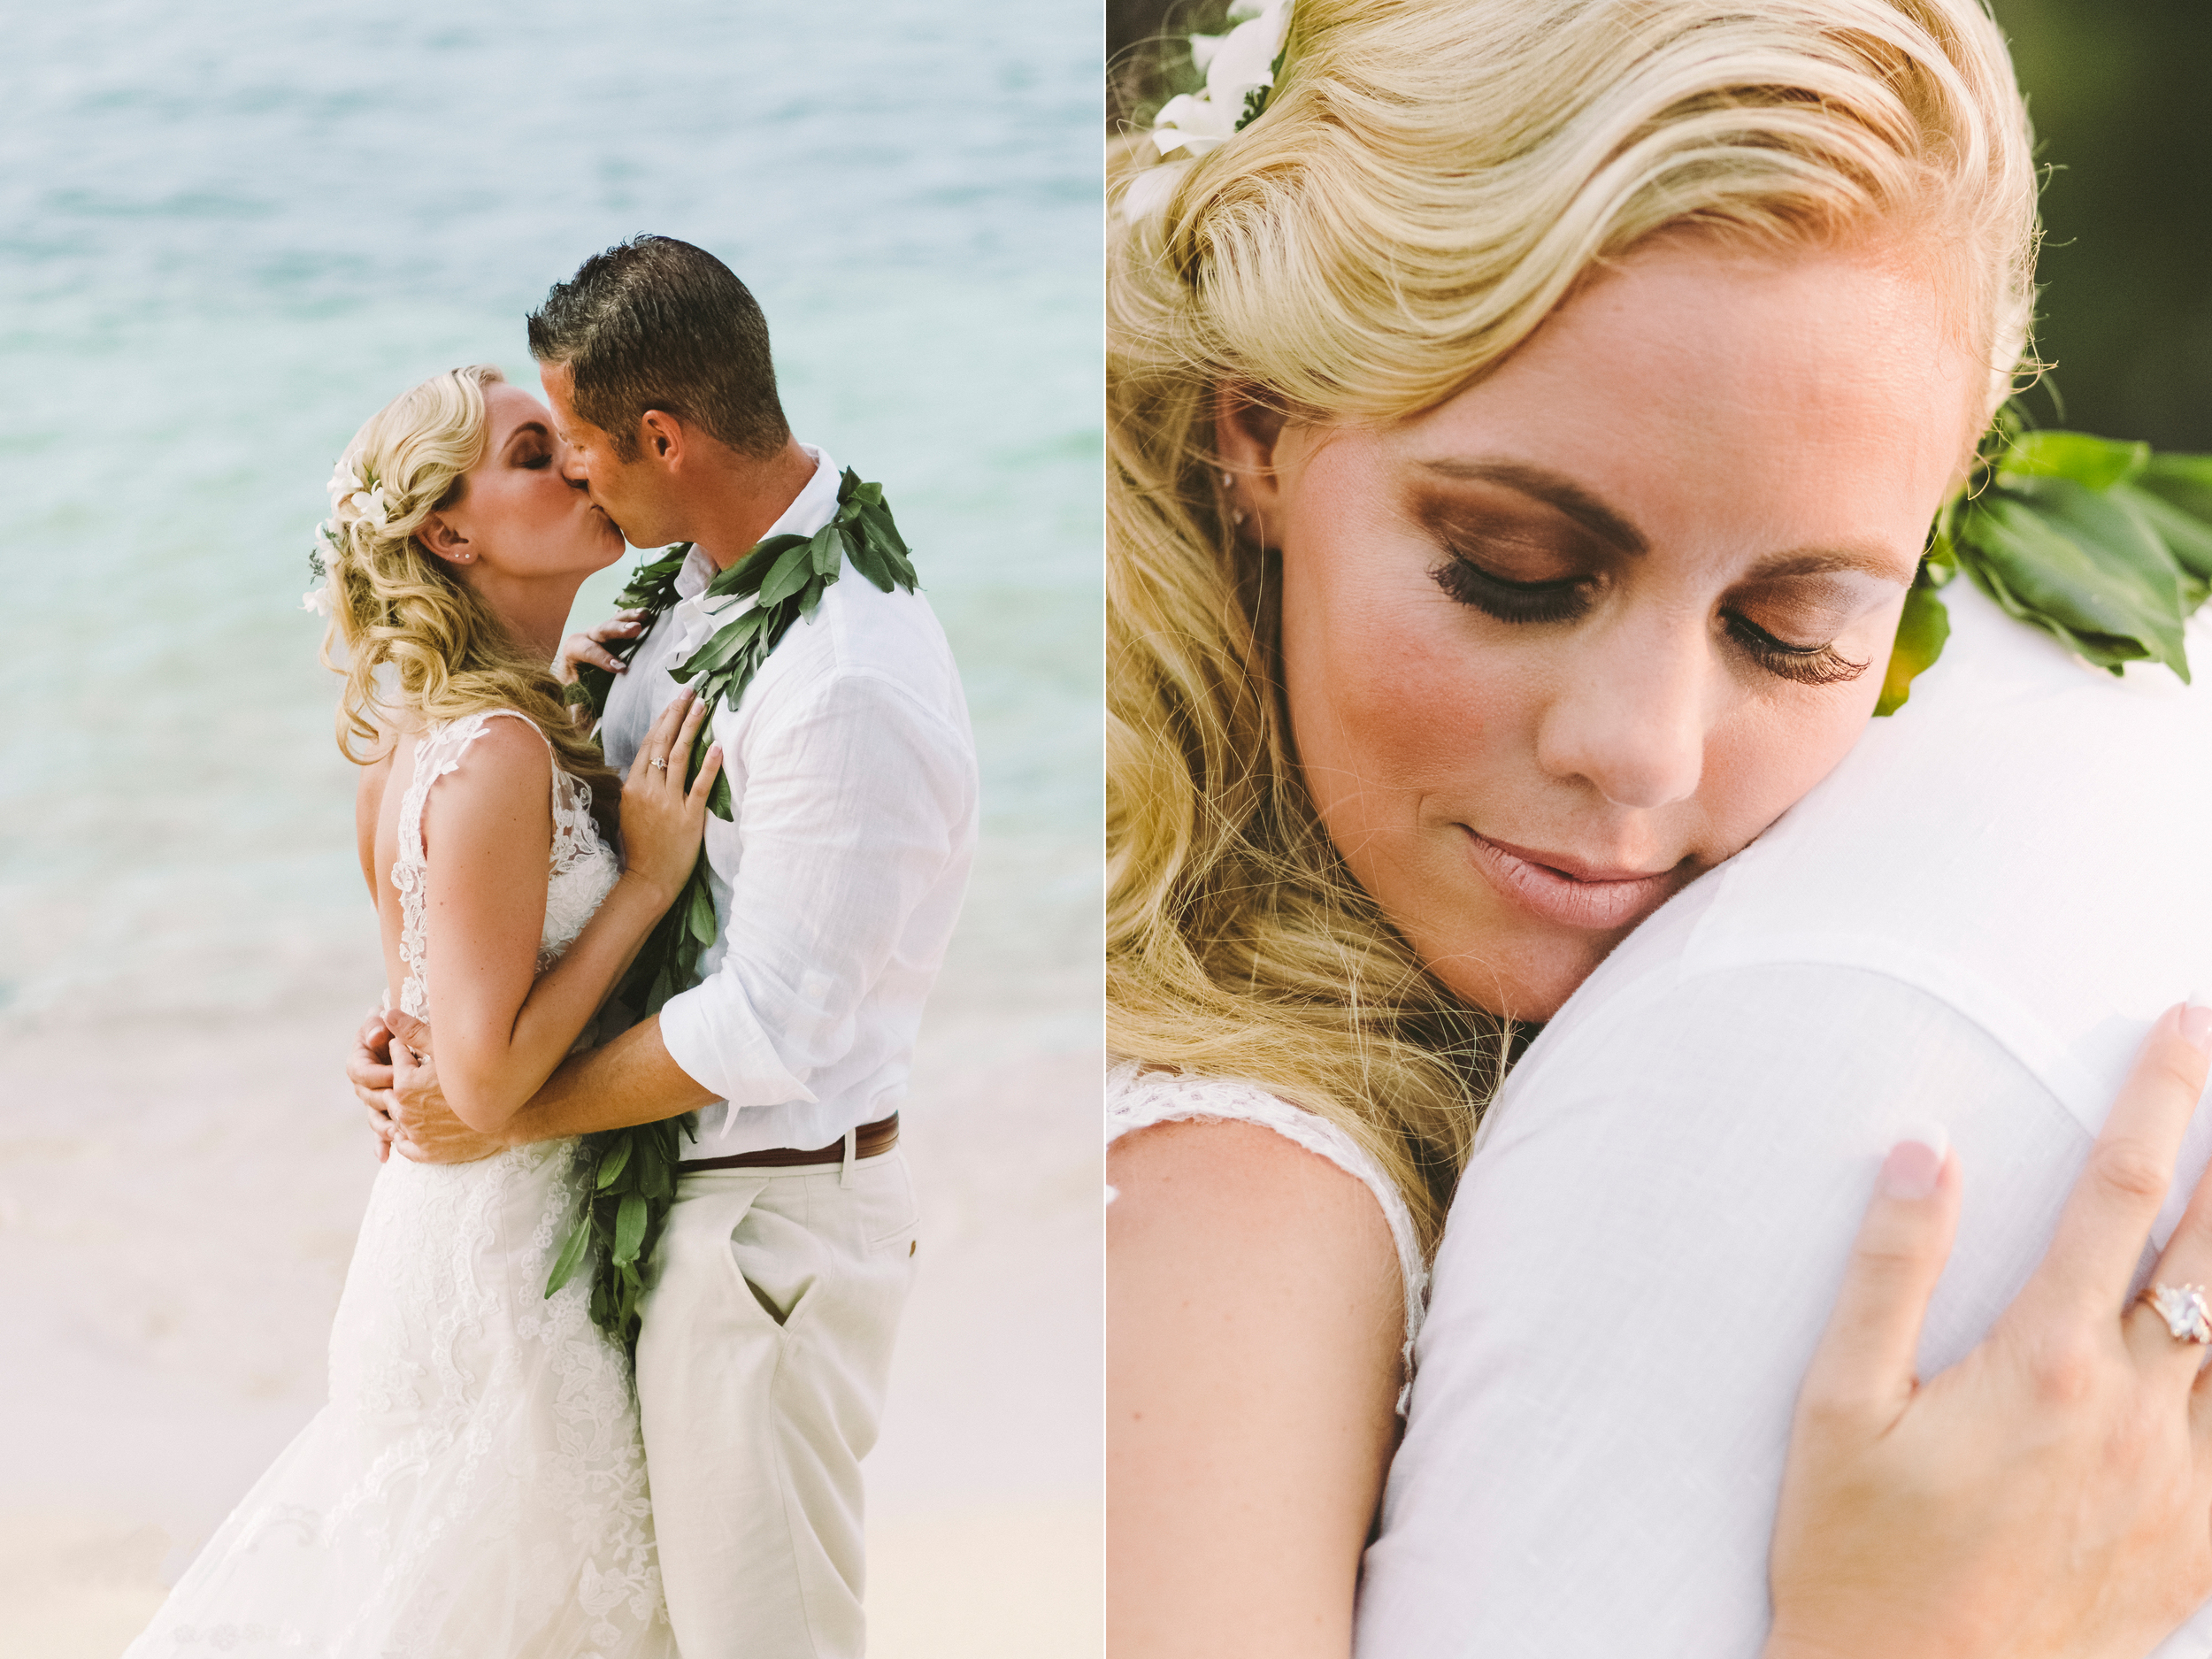 angie-diaz-photography-hawaii-wedding-photographer-kelli-jay-94.jpg